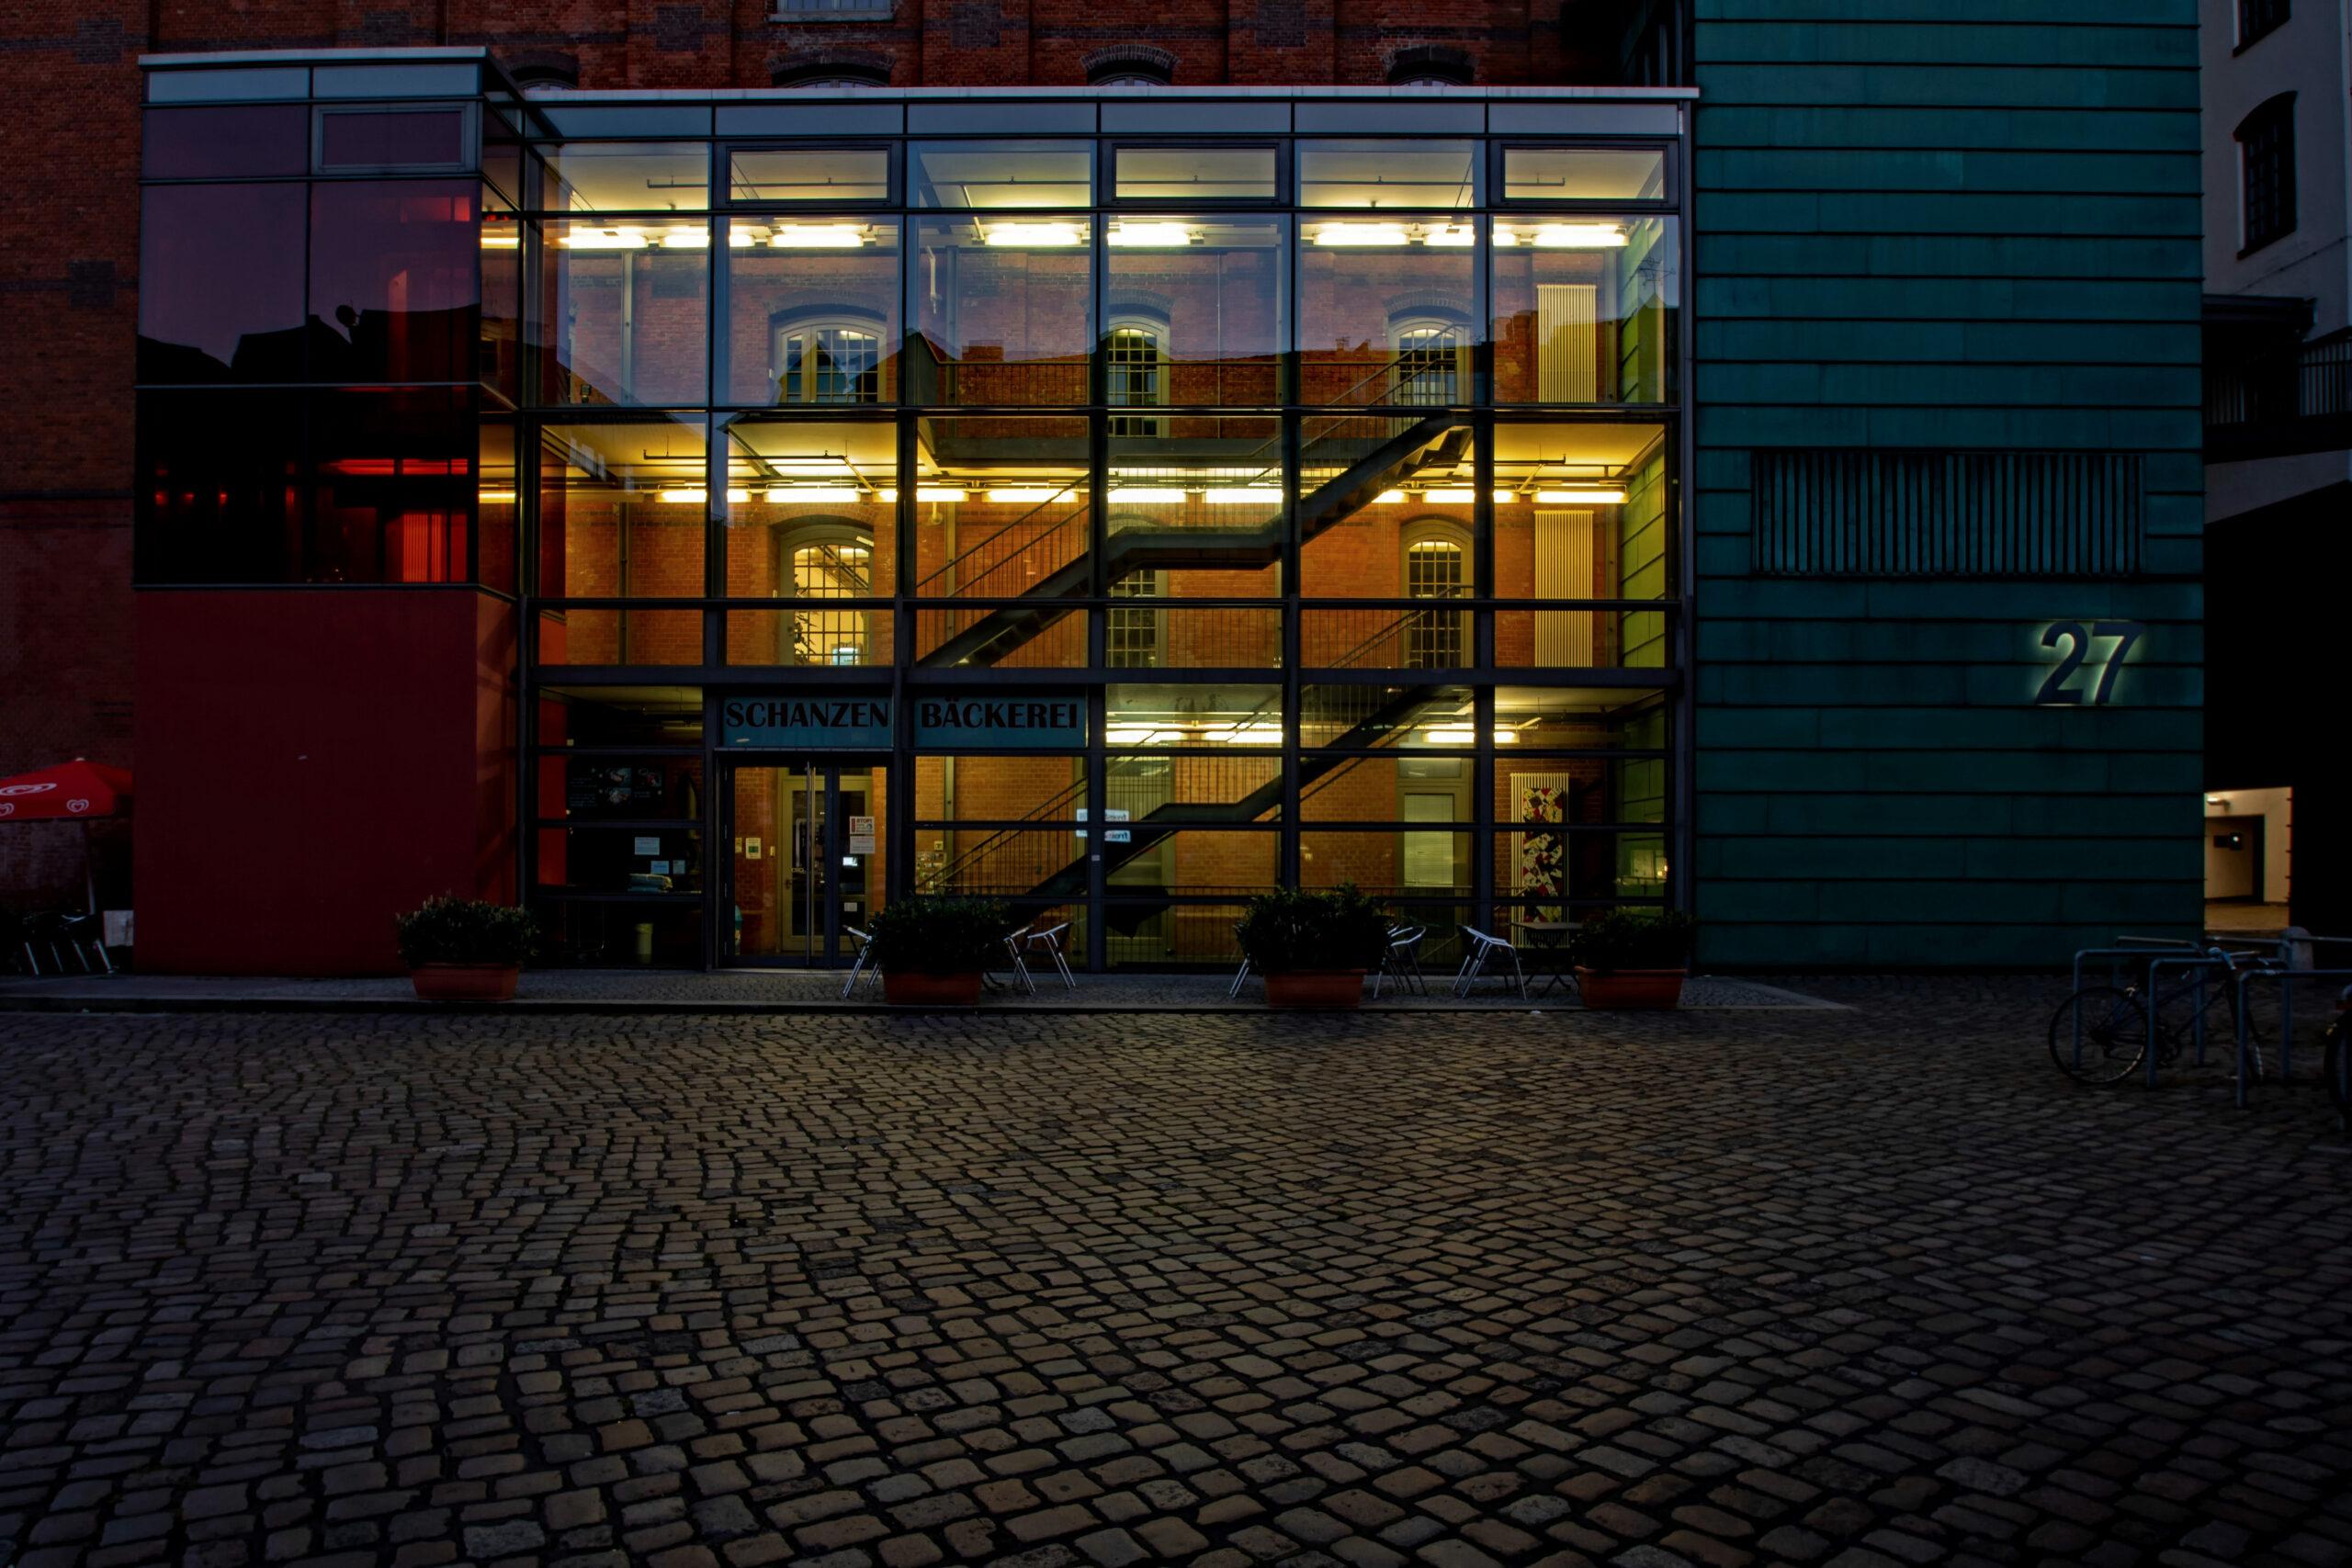 Hans Stötera - Fischmarkt am Abend 01.06.2021 - Nr.27